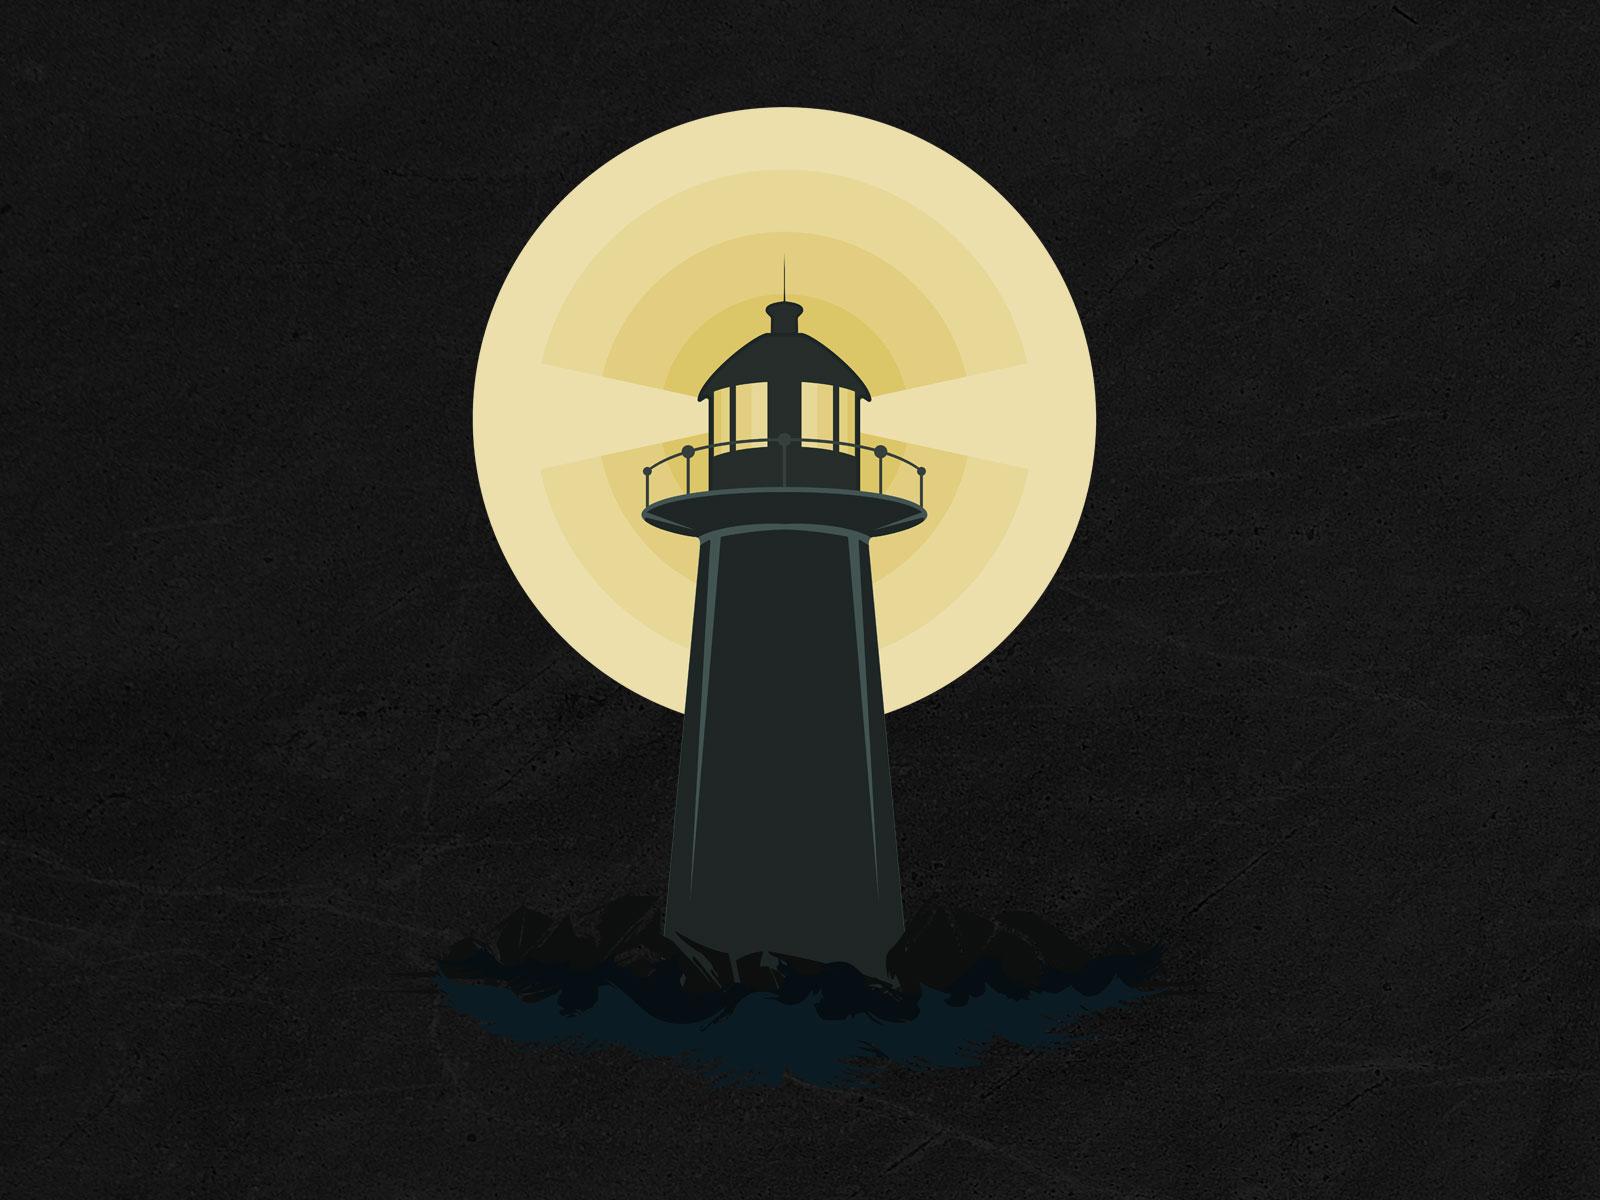 Light up the darkness landing image - Lighthouse – Light up the dark Light up the darkness landing image - Portfolio – Print on demand